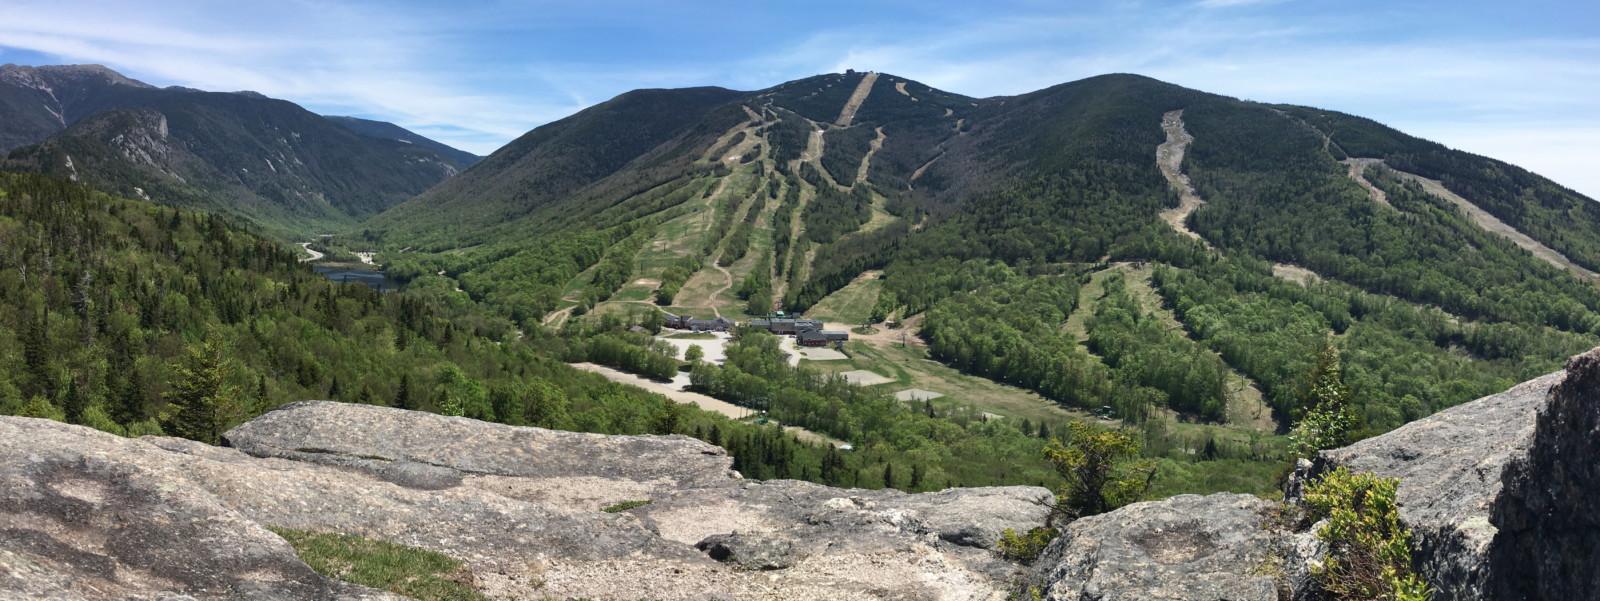 Hiking Shoes - Mountain